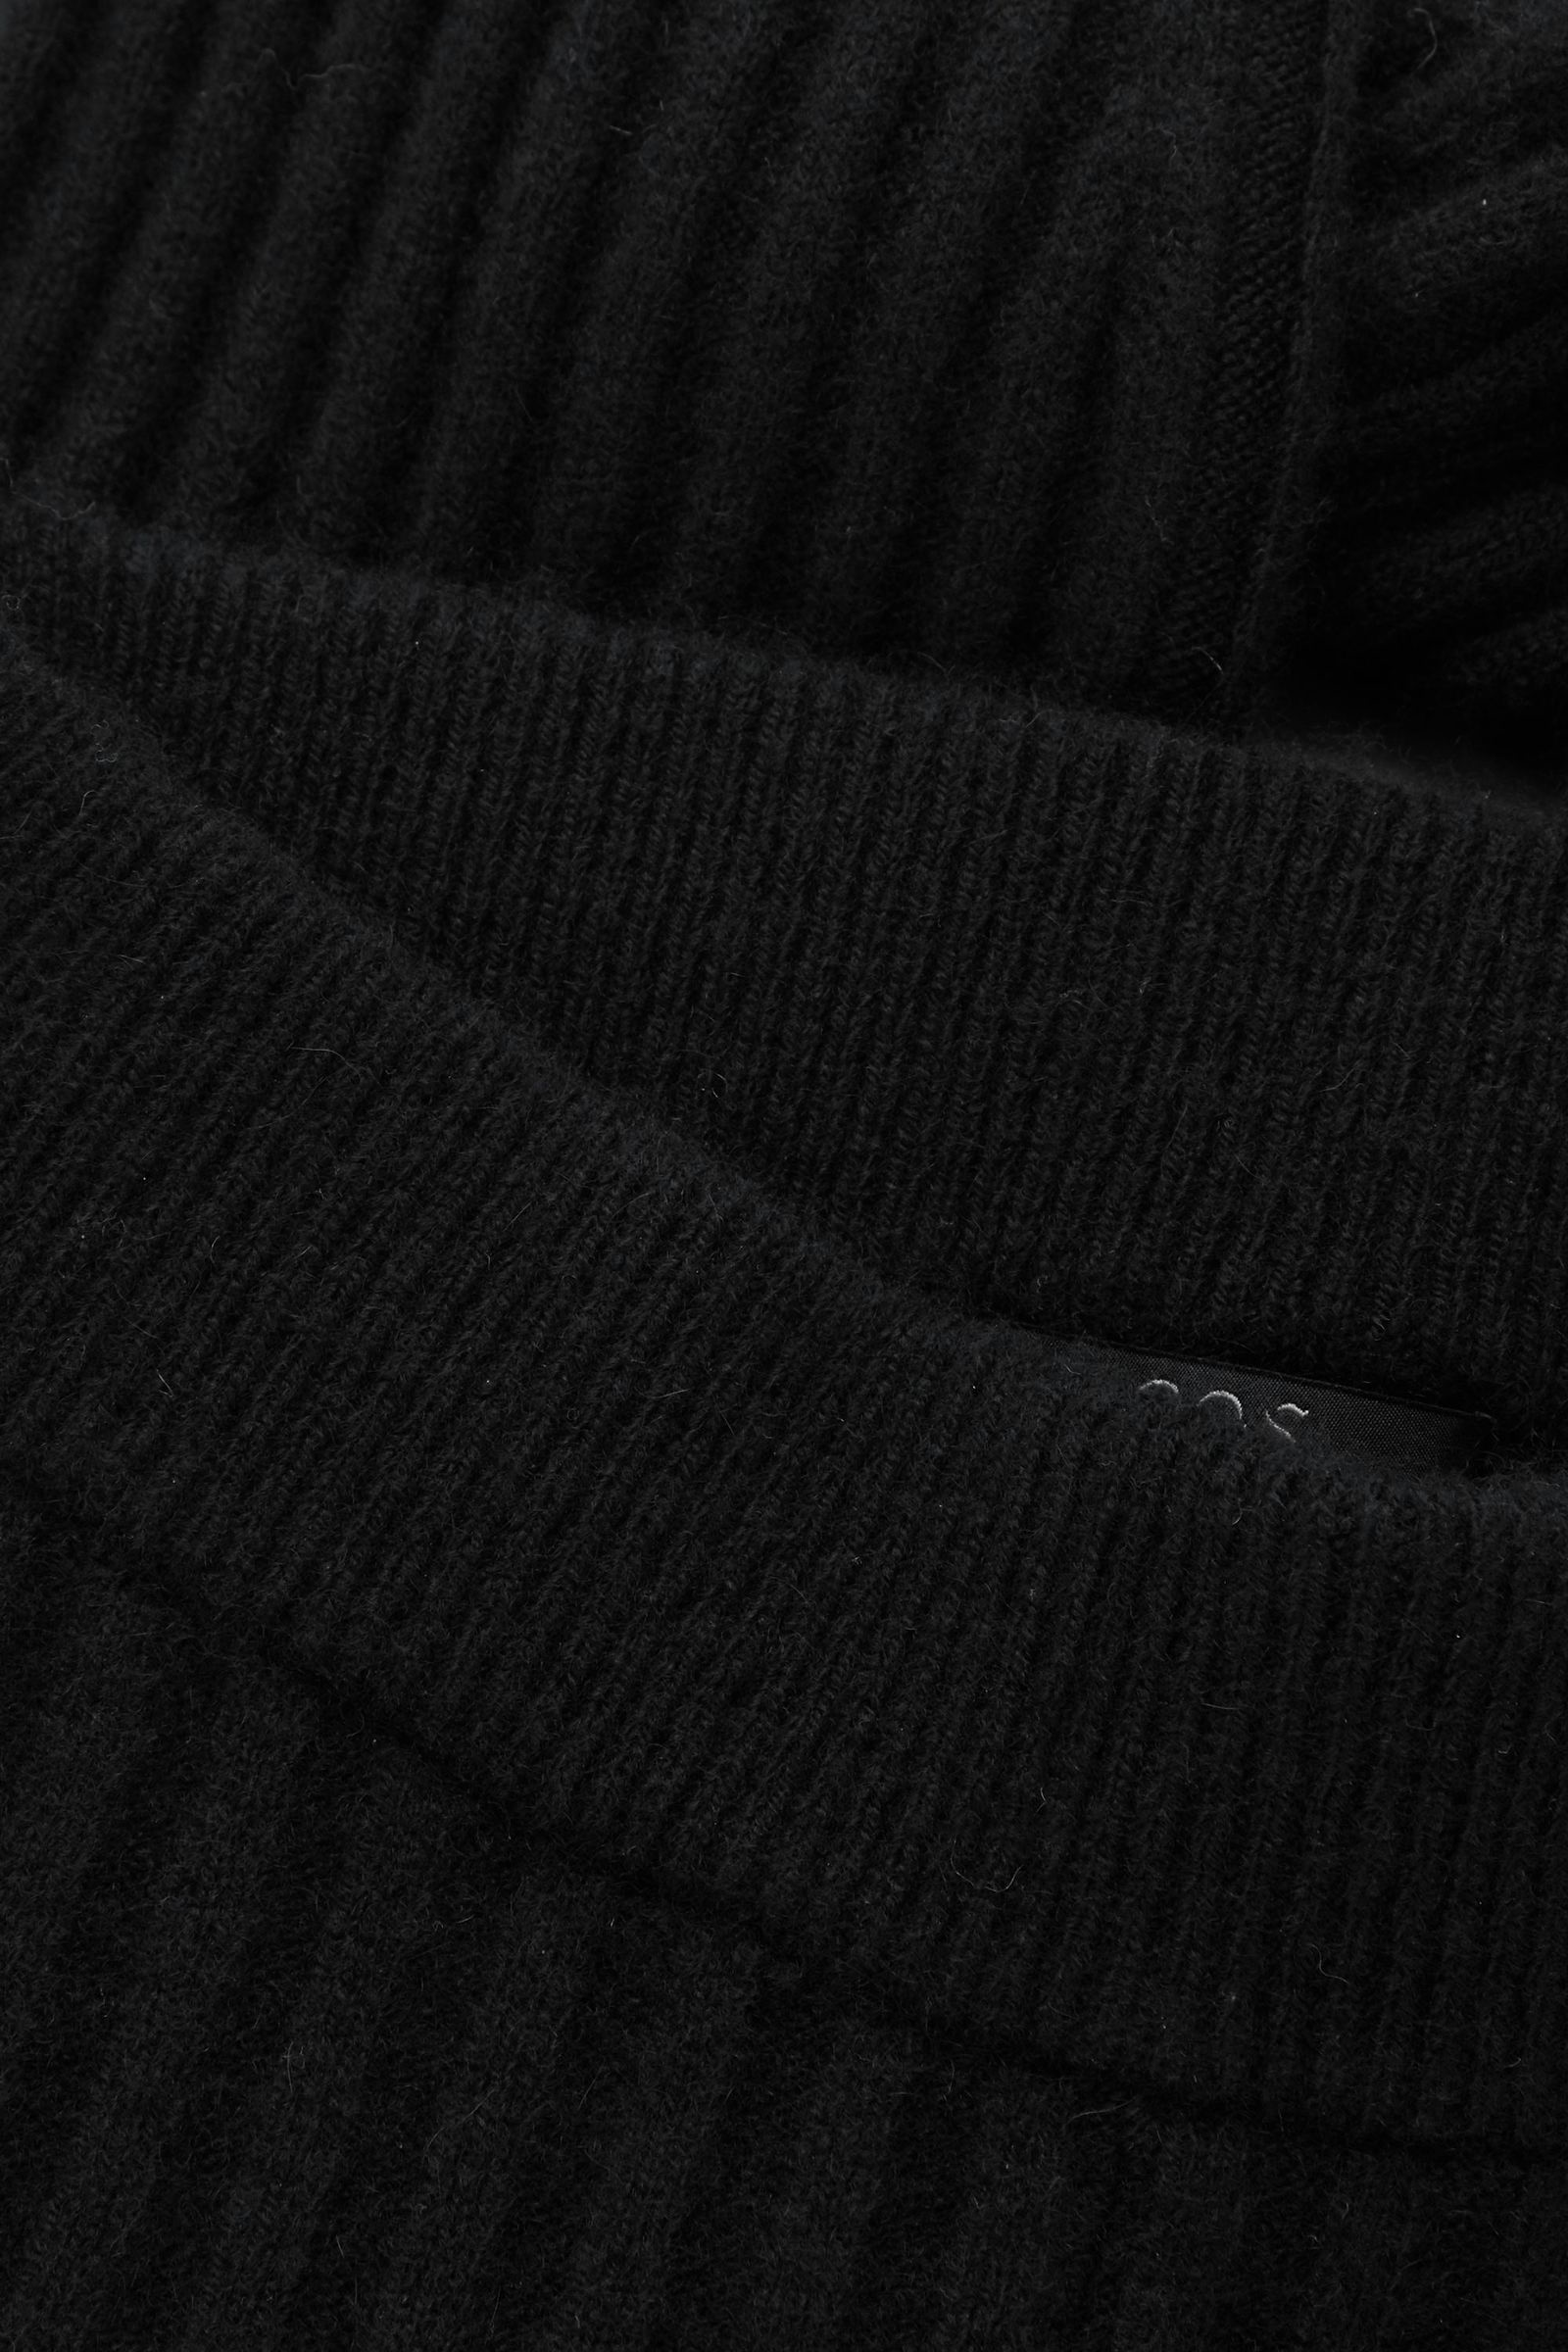 COS 리브 캐시미어 레깅스의 블랙컬러 Detail입니다.